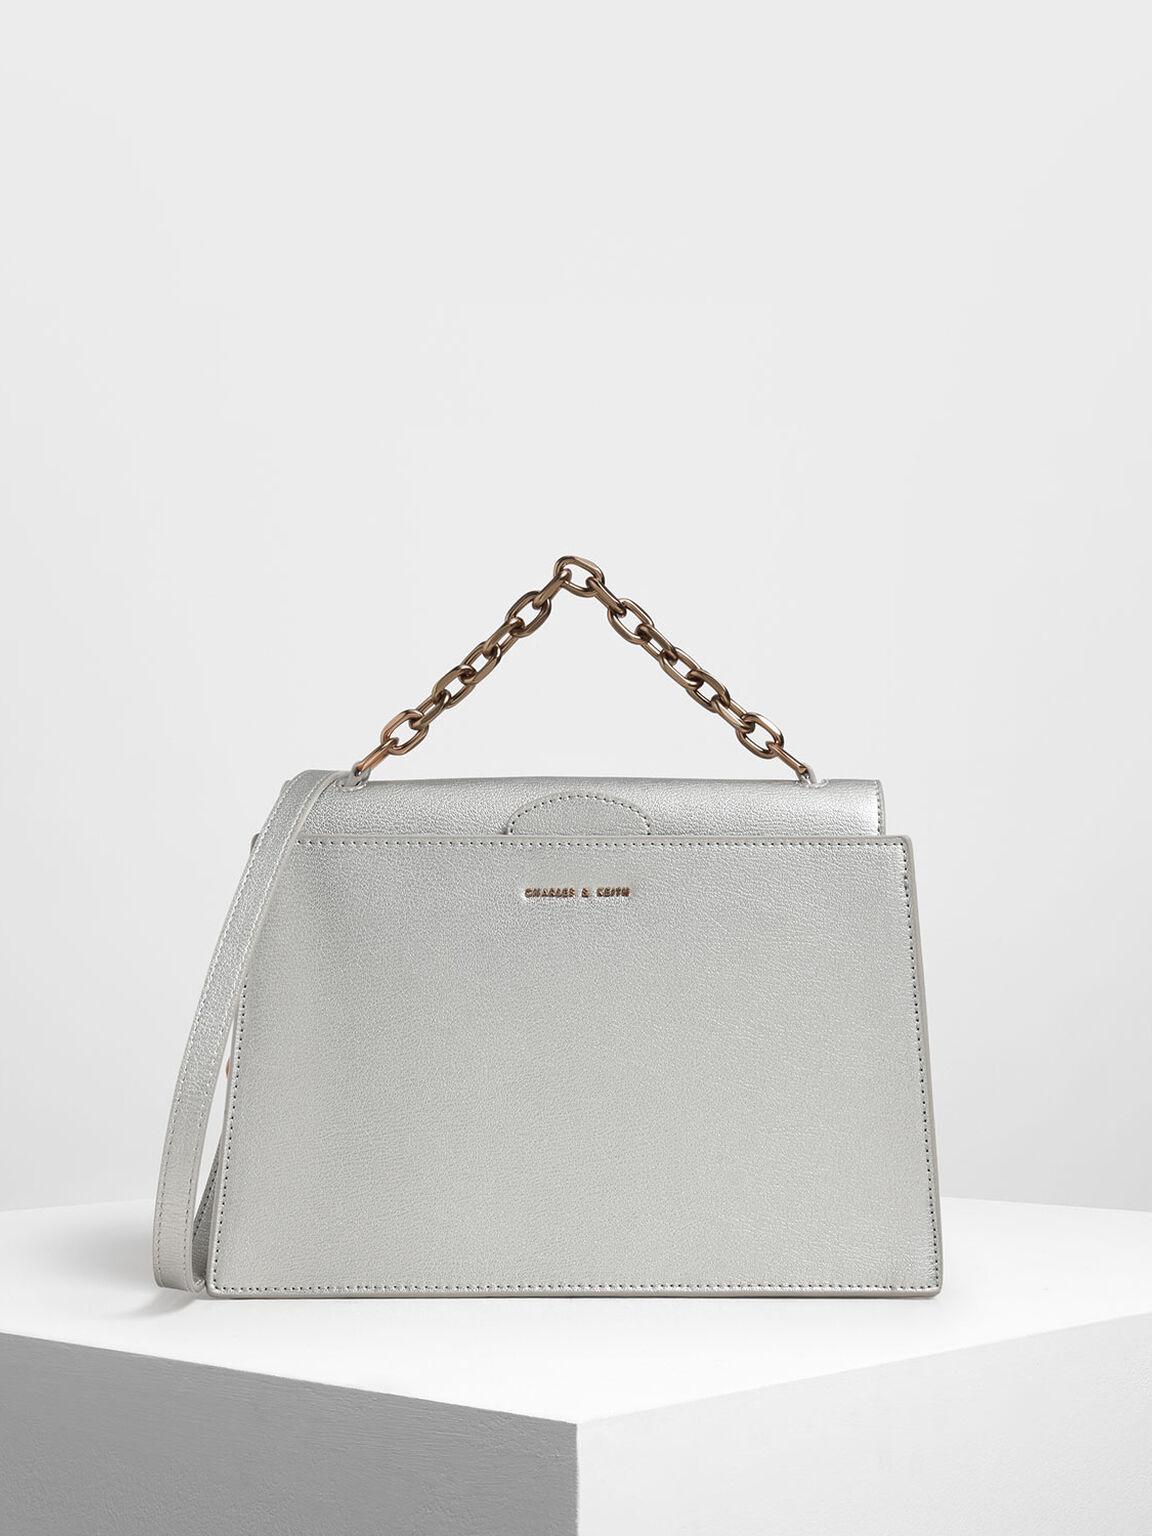 Tuck-In Flap Bag, Silver, hi-res